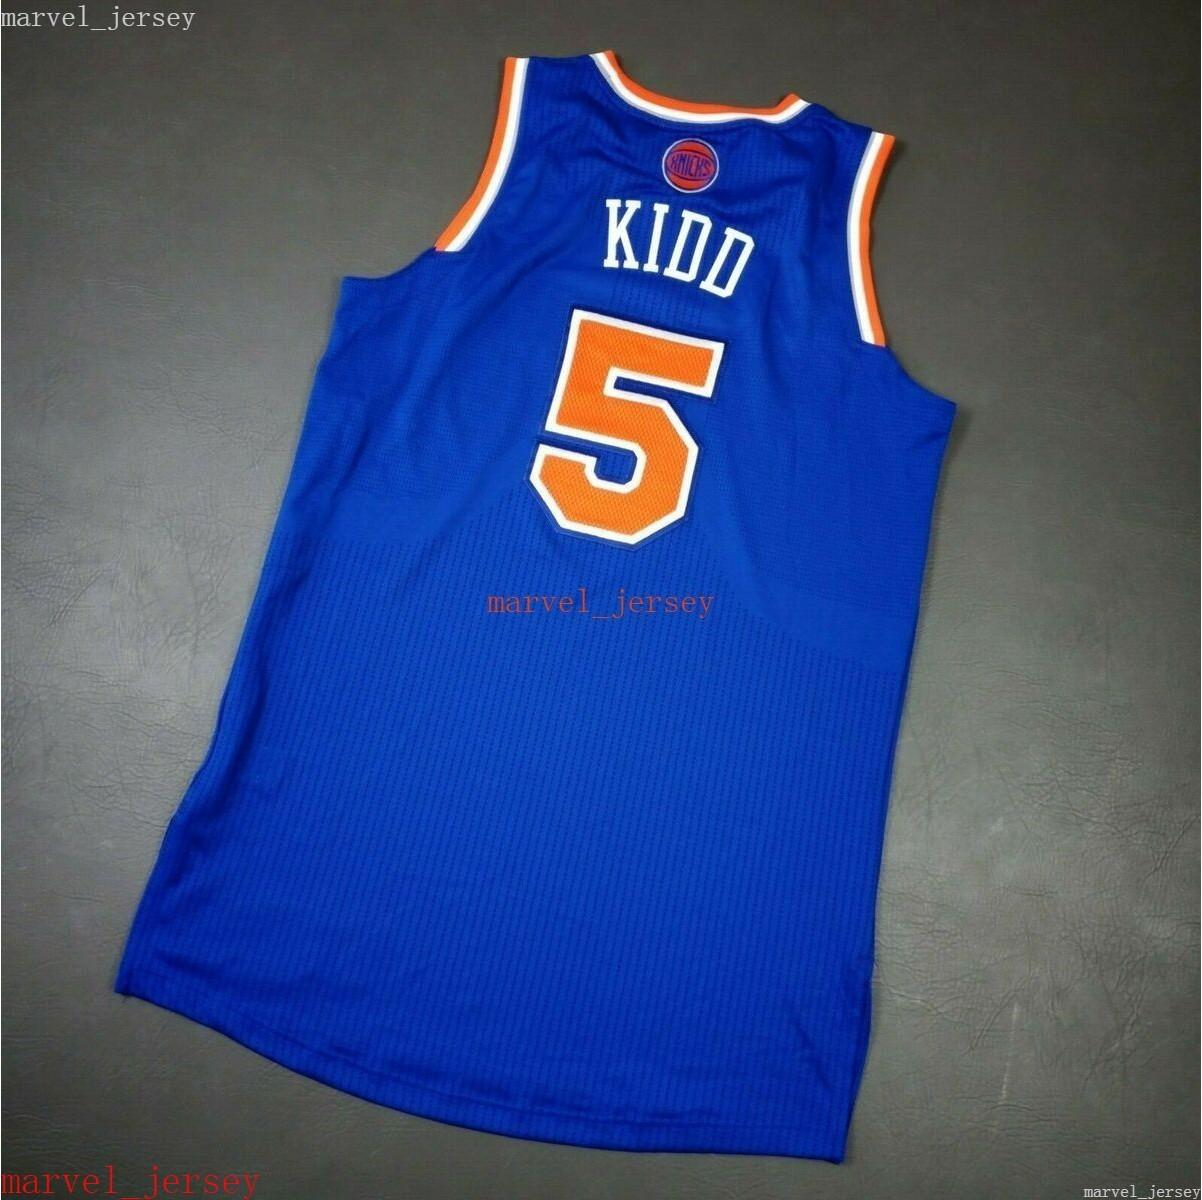 Jason Kidd 2012 sur mesure Jason Kidd 2012 Jersey XS-6XL Dettage des maillots de basket-ball Jerseys bon marché Femmes jeunesse